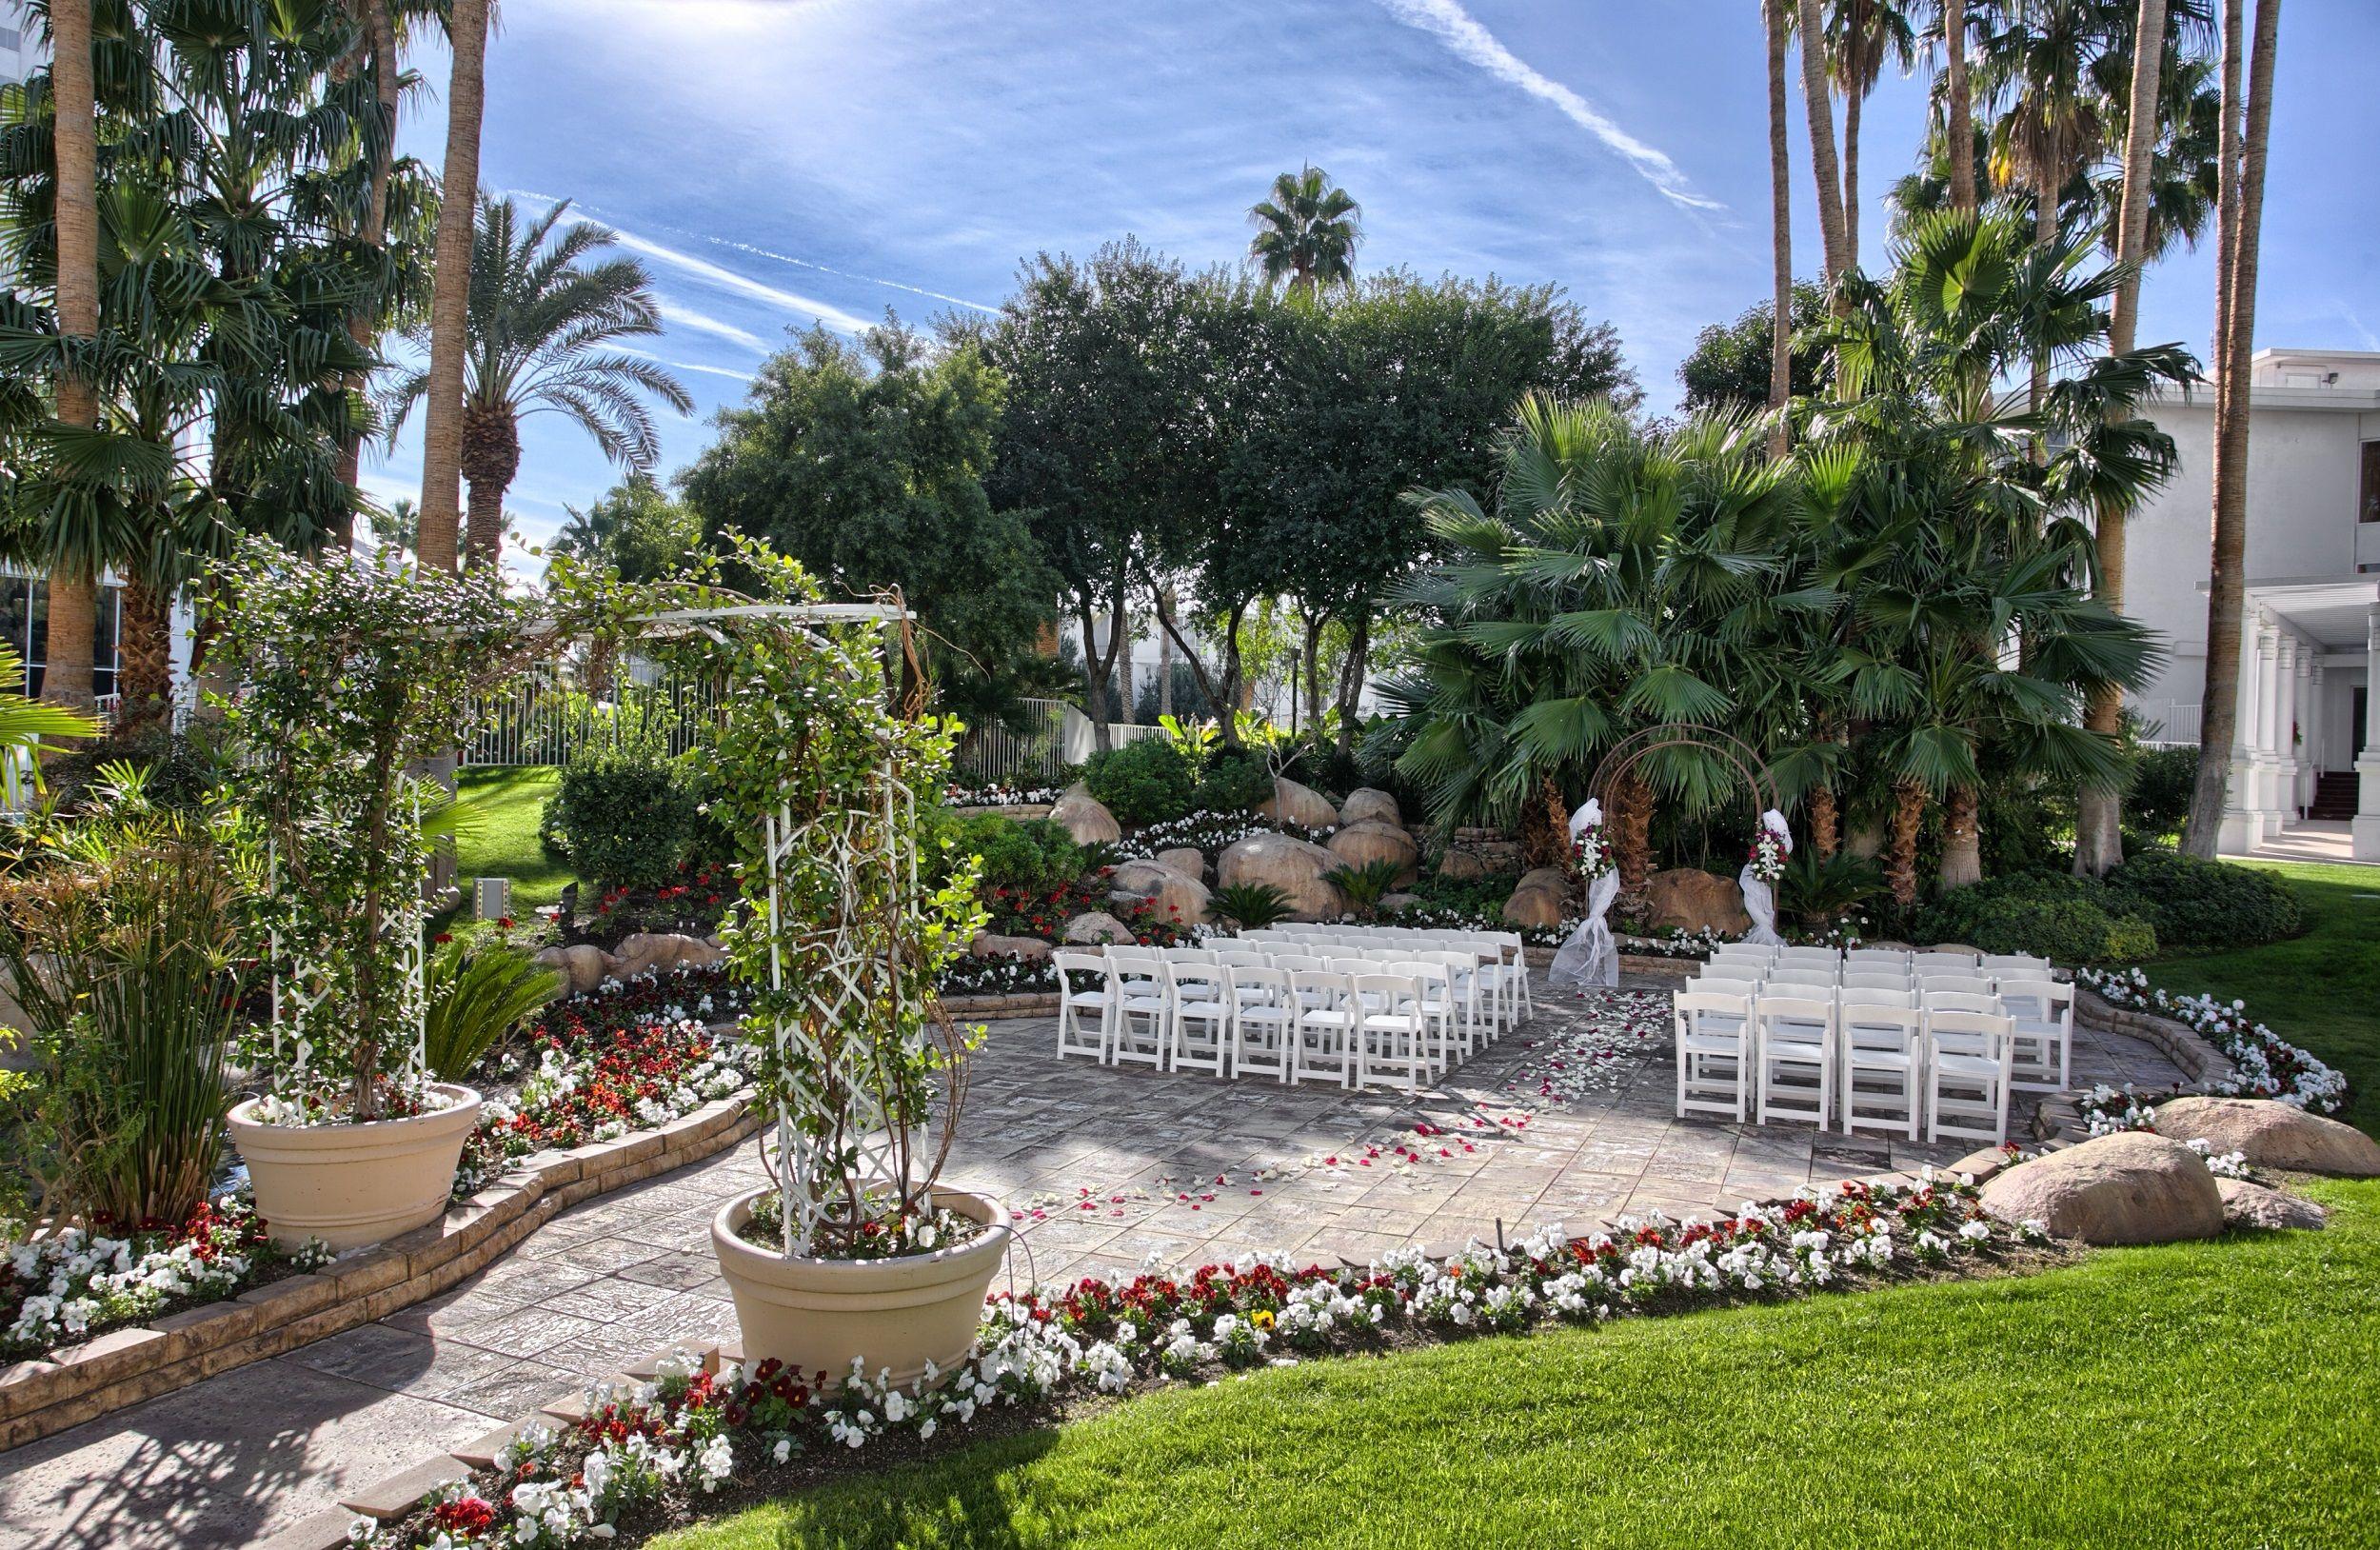 Tropicana Lv Weddings Island Courtyard Las Vegas Wedding Chapel Tropical Chapels Photography Lasvegaswedding Vegaswedding